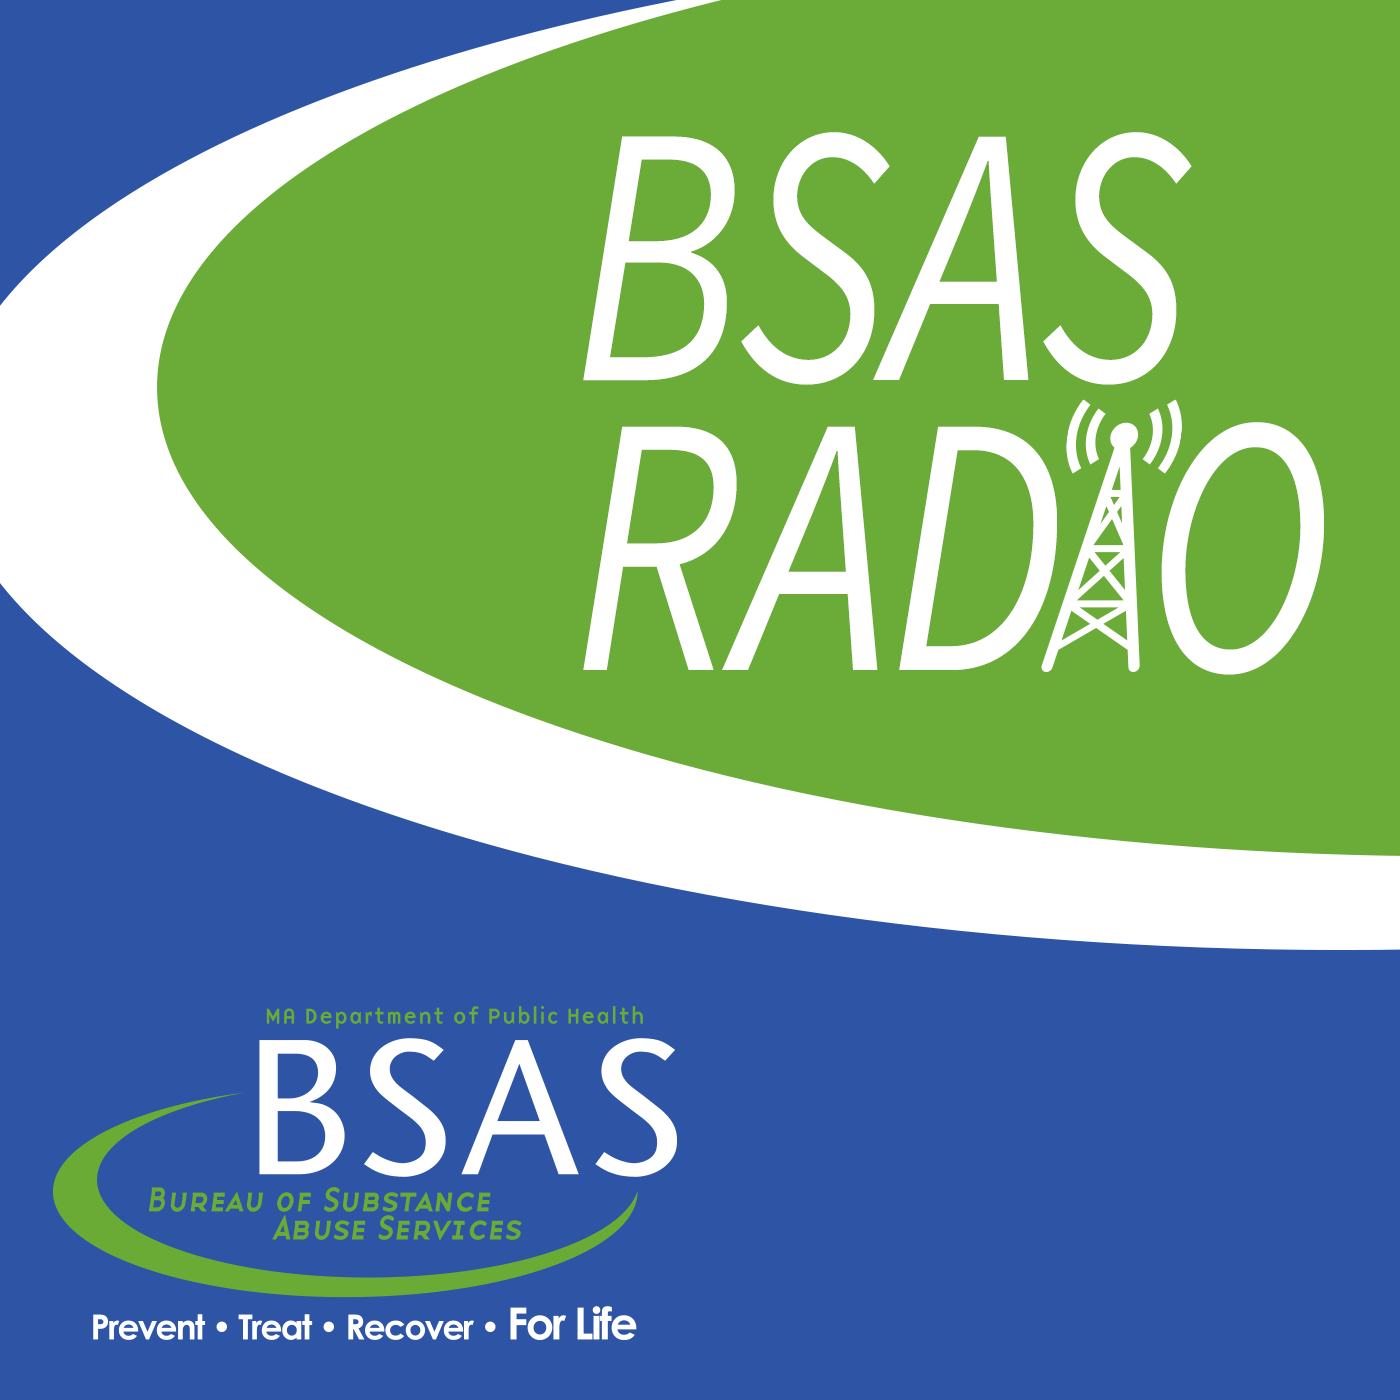 BSAS Radio show art